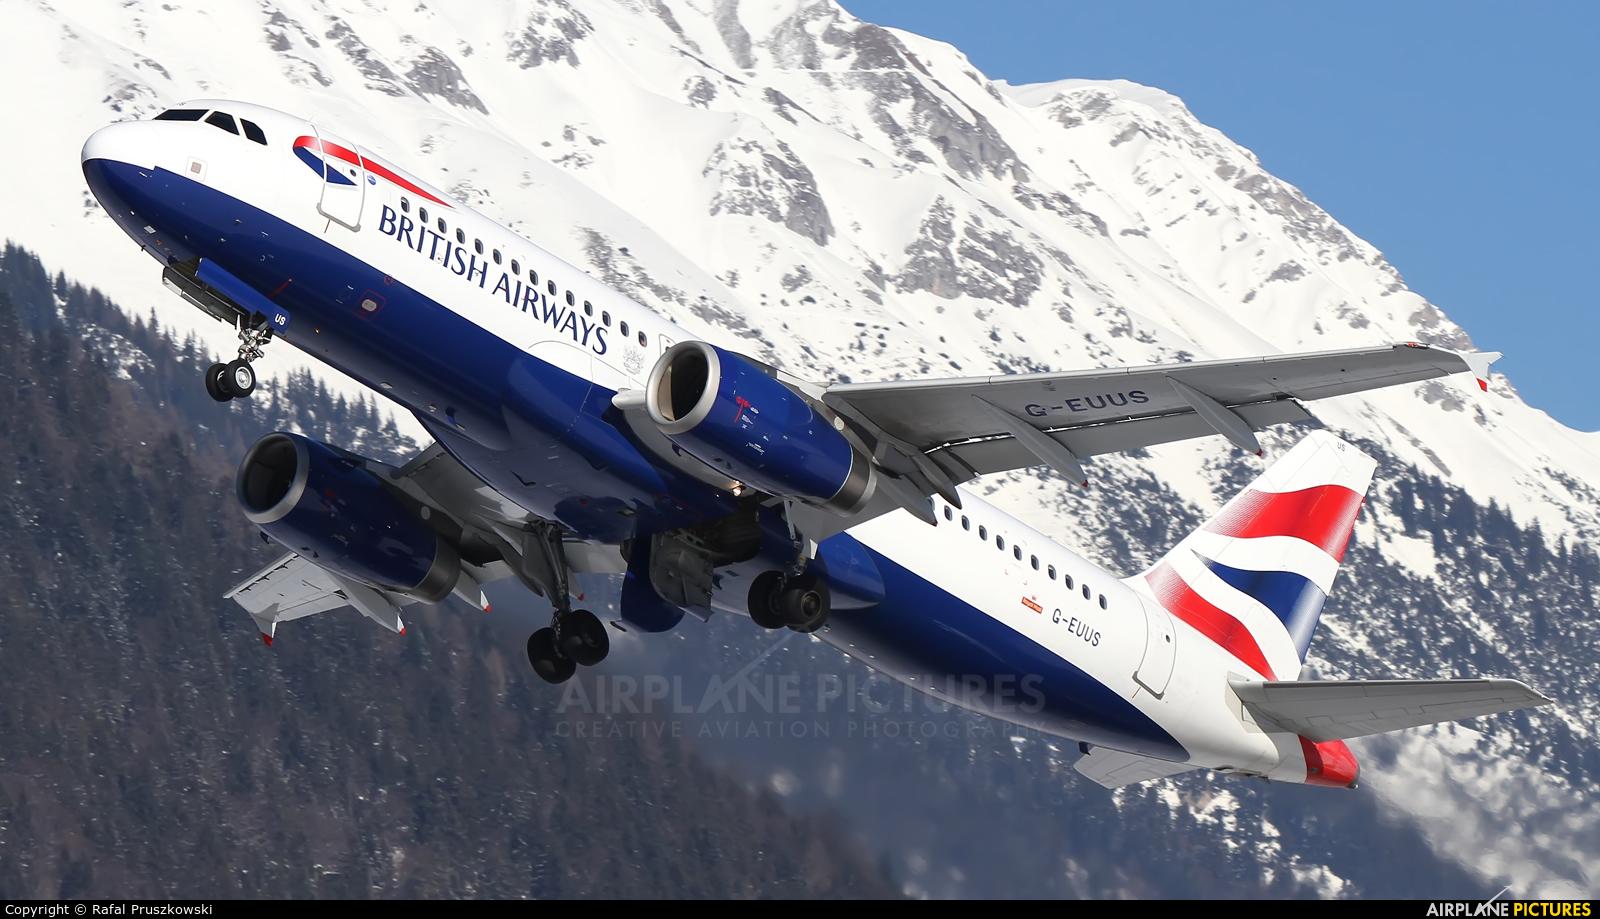 British Airways G-EUUS aircraft at Innsbruck